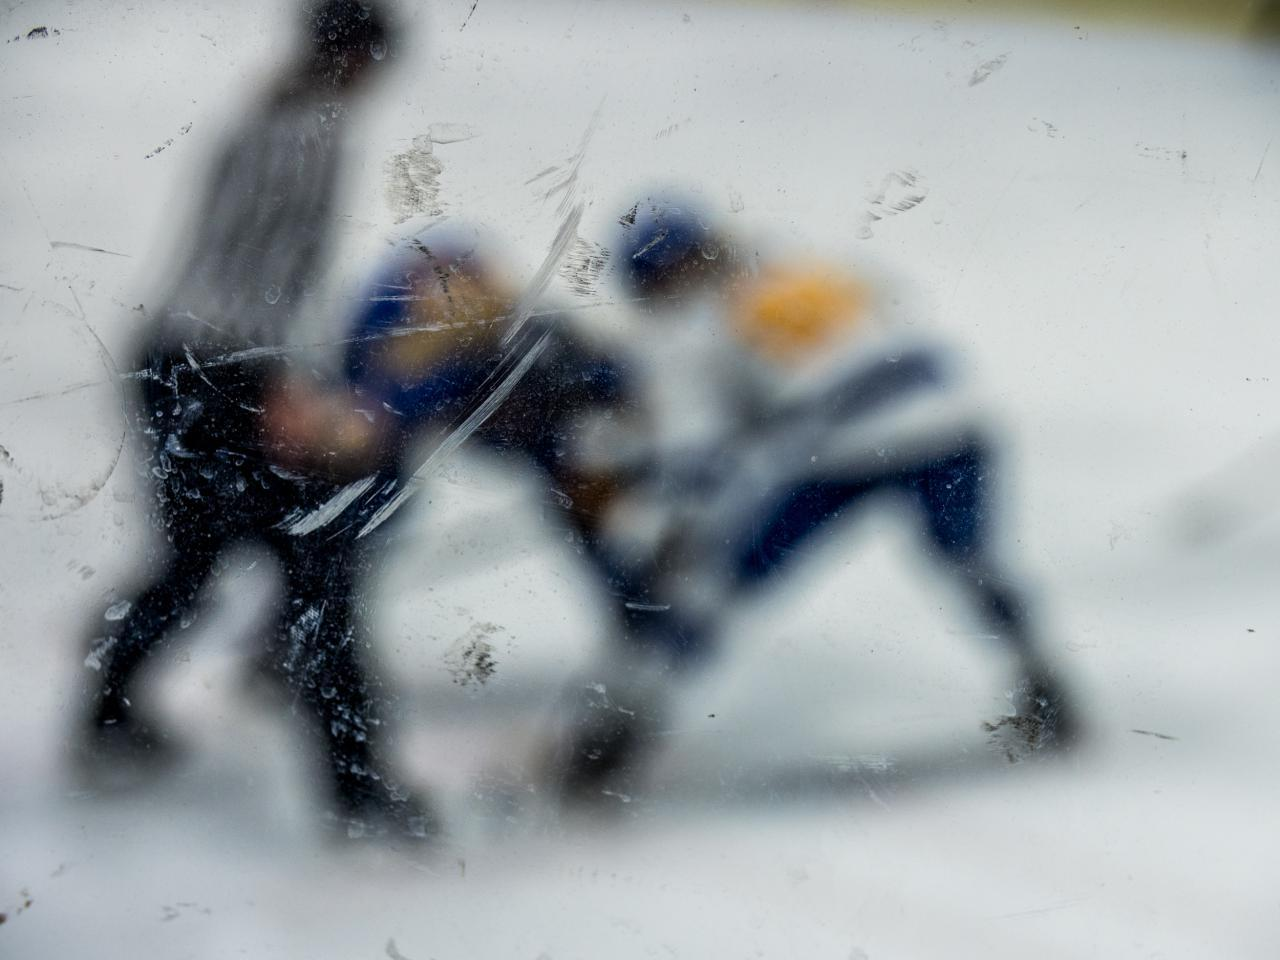 Ice-Hockey-the-ubyssey-Saman-Shariati-12.jpg